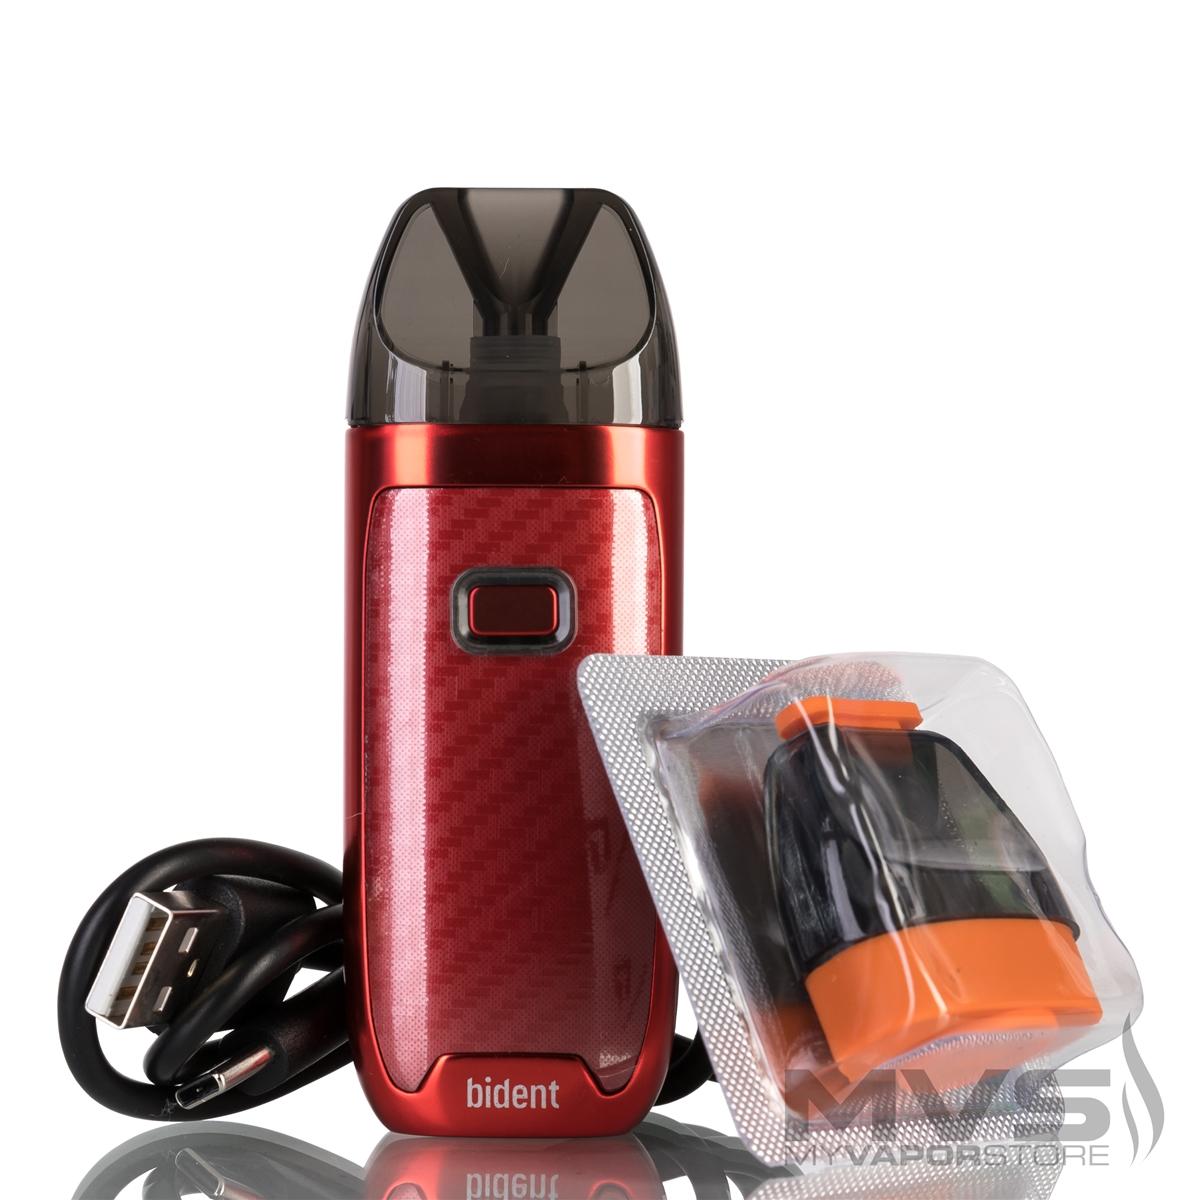 Geekvape Bident Vape Kit Pod System